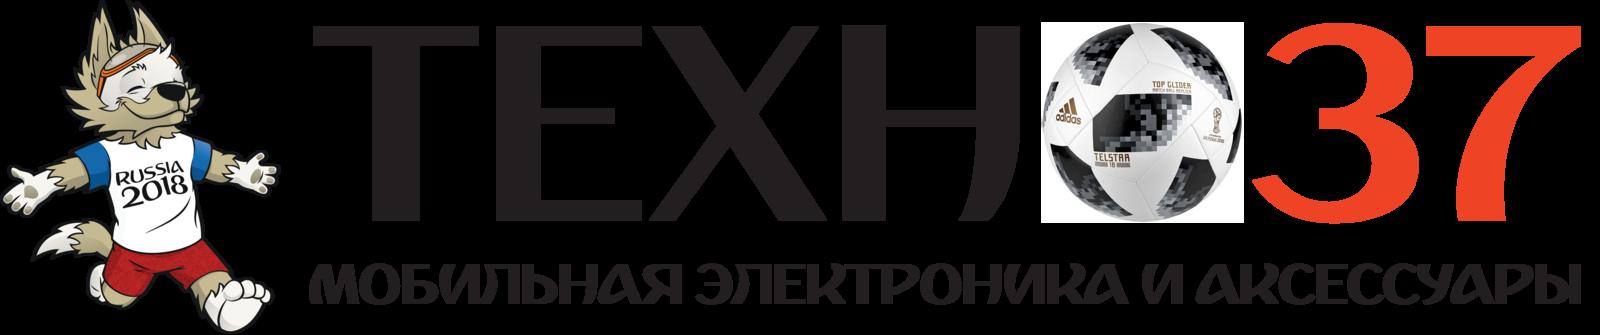 ТЕХНО37 в Иваново